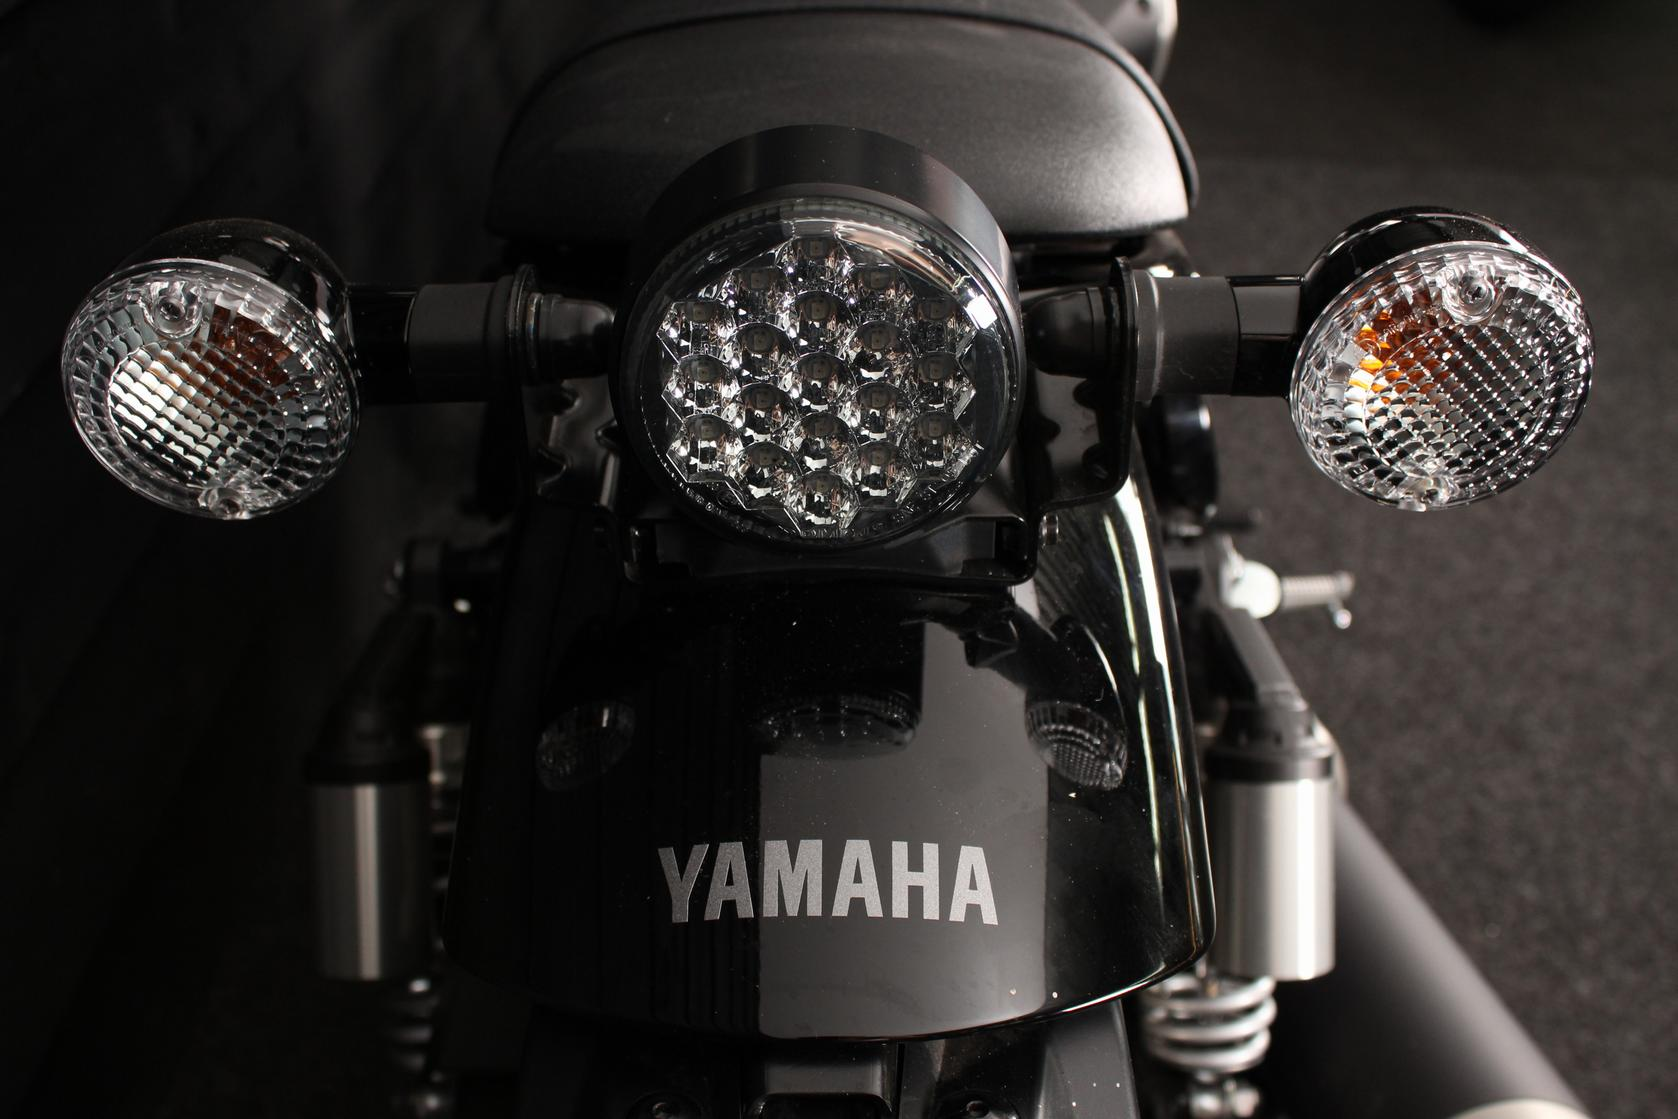 YAMAHA - SCR 950 ABS